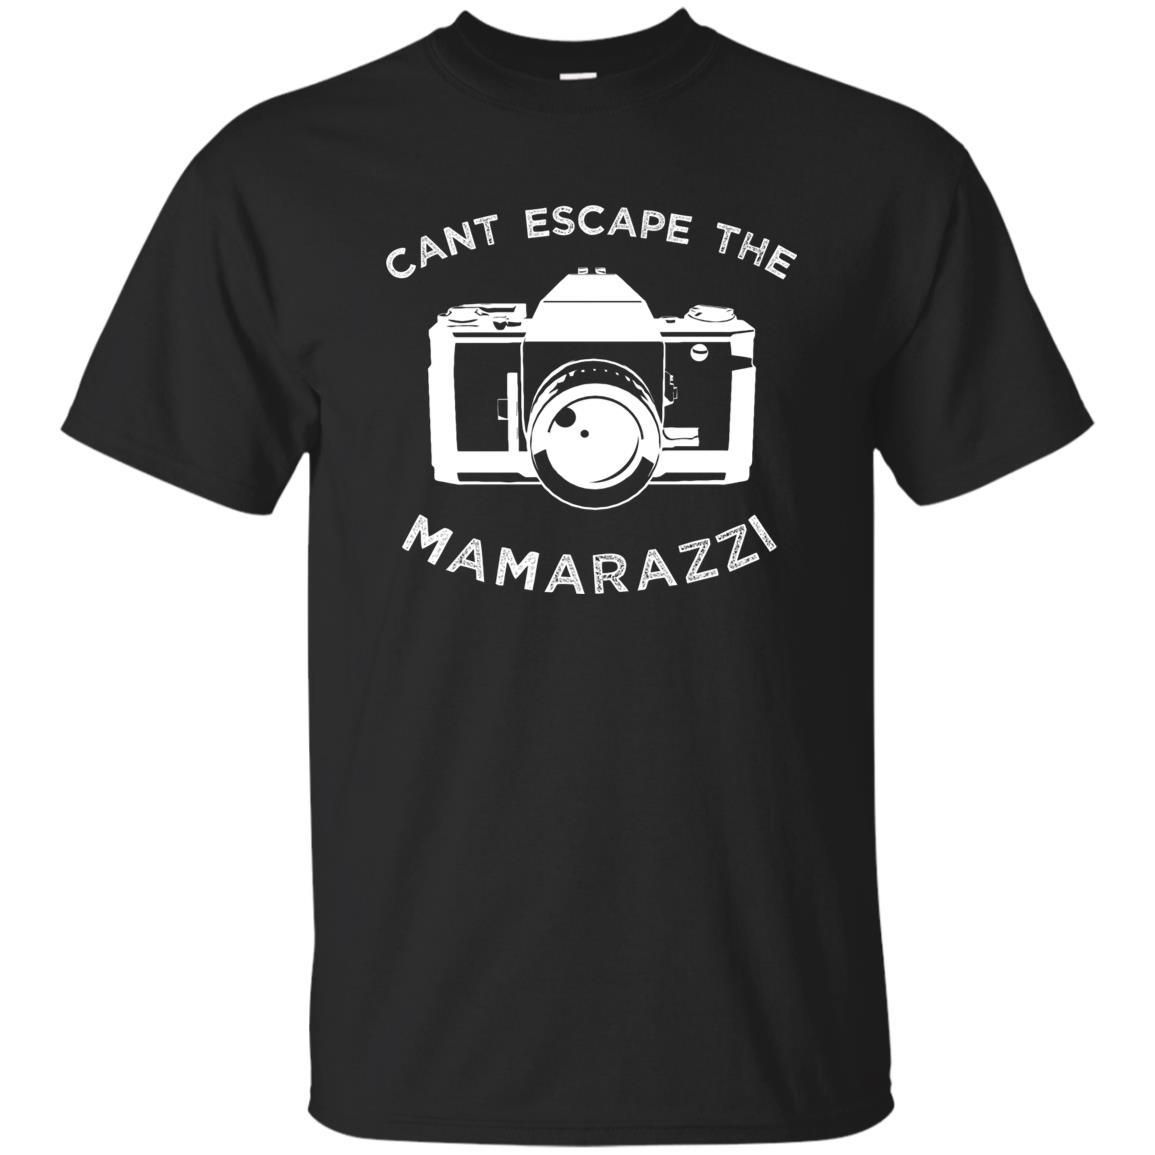 Funny Camera Cant Escape The Mamarazzi Unisex Short Sleeve